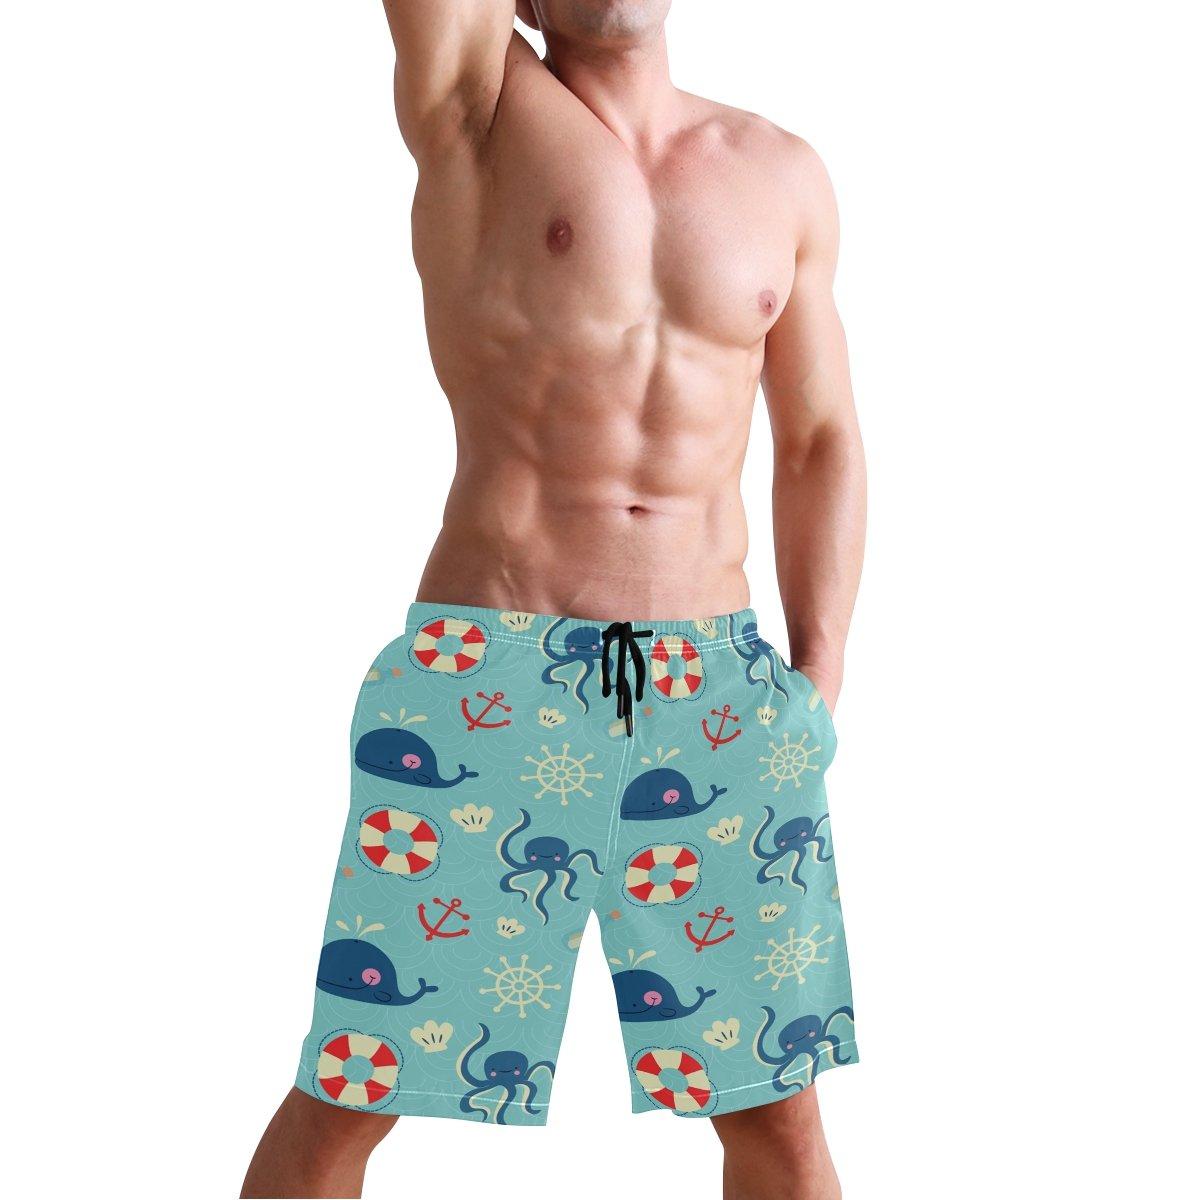 Cartoon Ocean Element Animal Mens Swim Trunks Quick Dry Beach Board Shorts with Drawstring Pocket